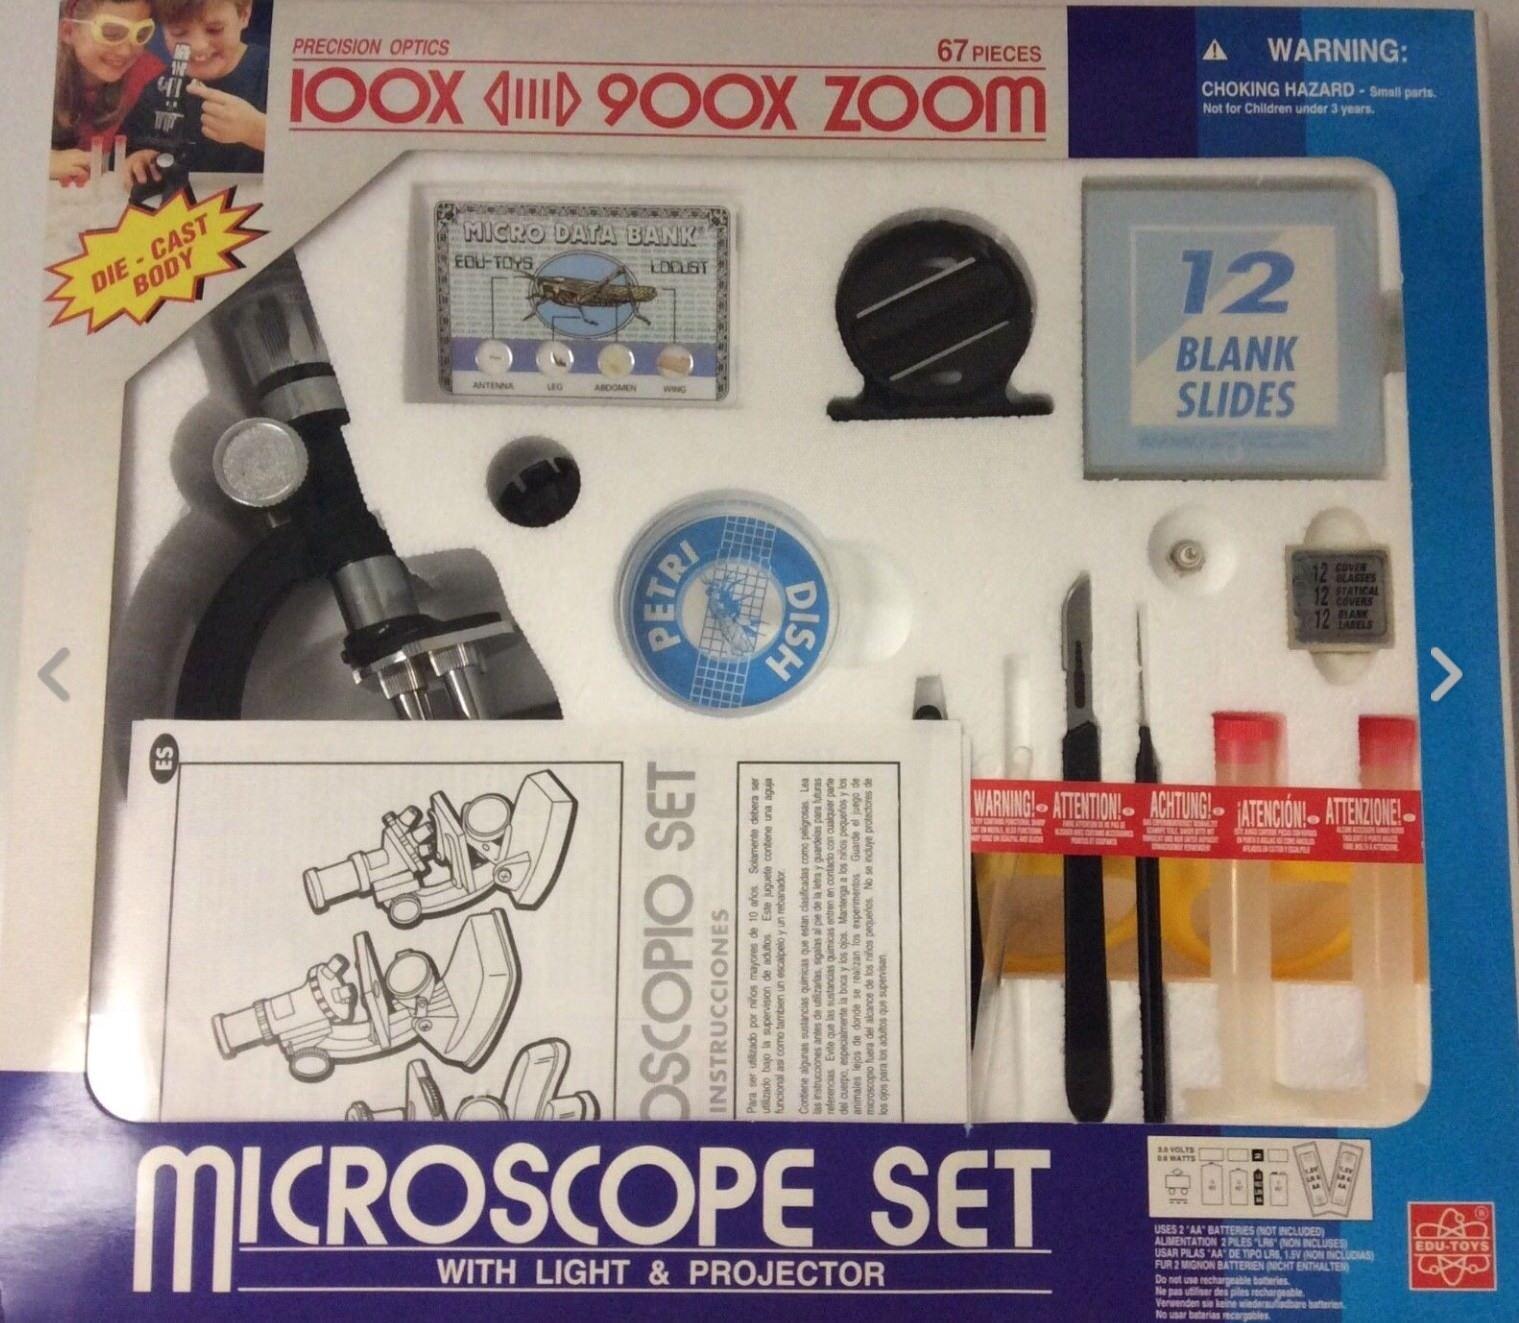 Mikroskop med ljus och PROJEKTOR.100x 900x ZOOM.67 PIECES.PRECISION OPTIC.